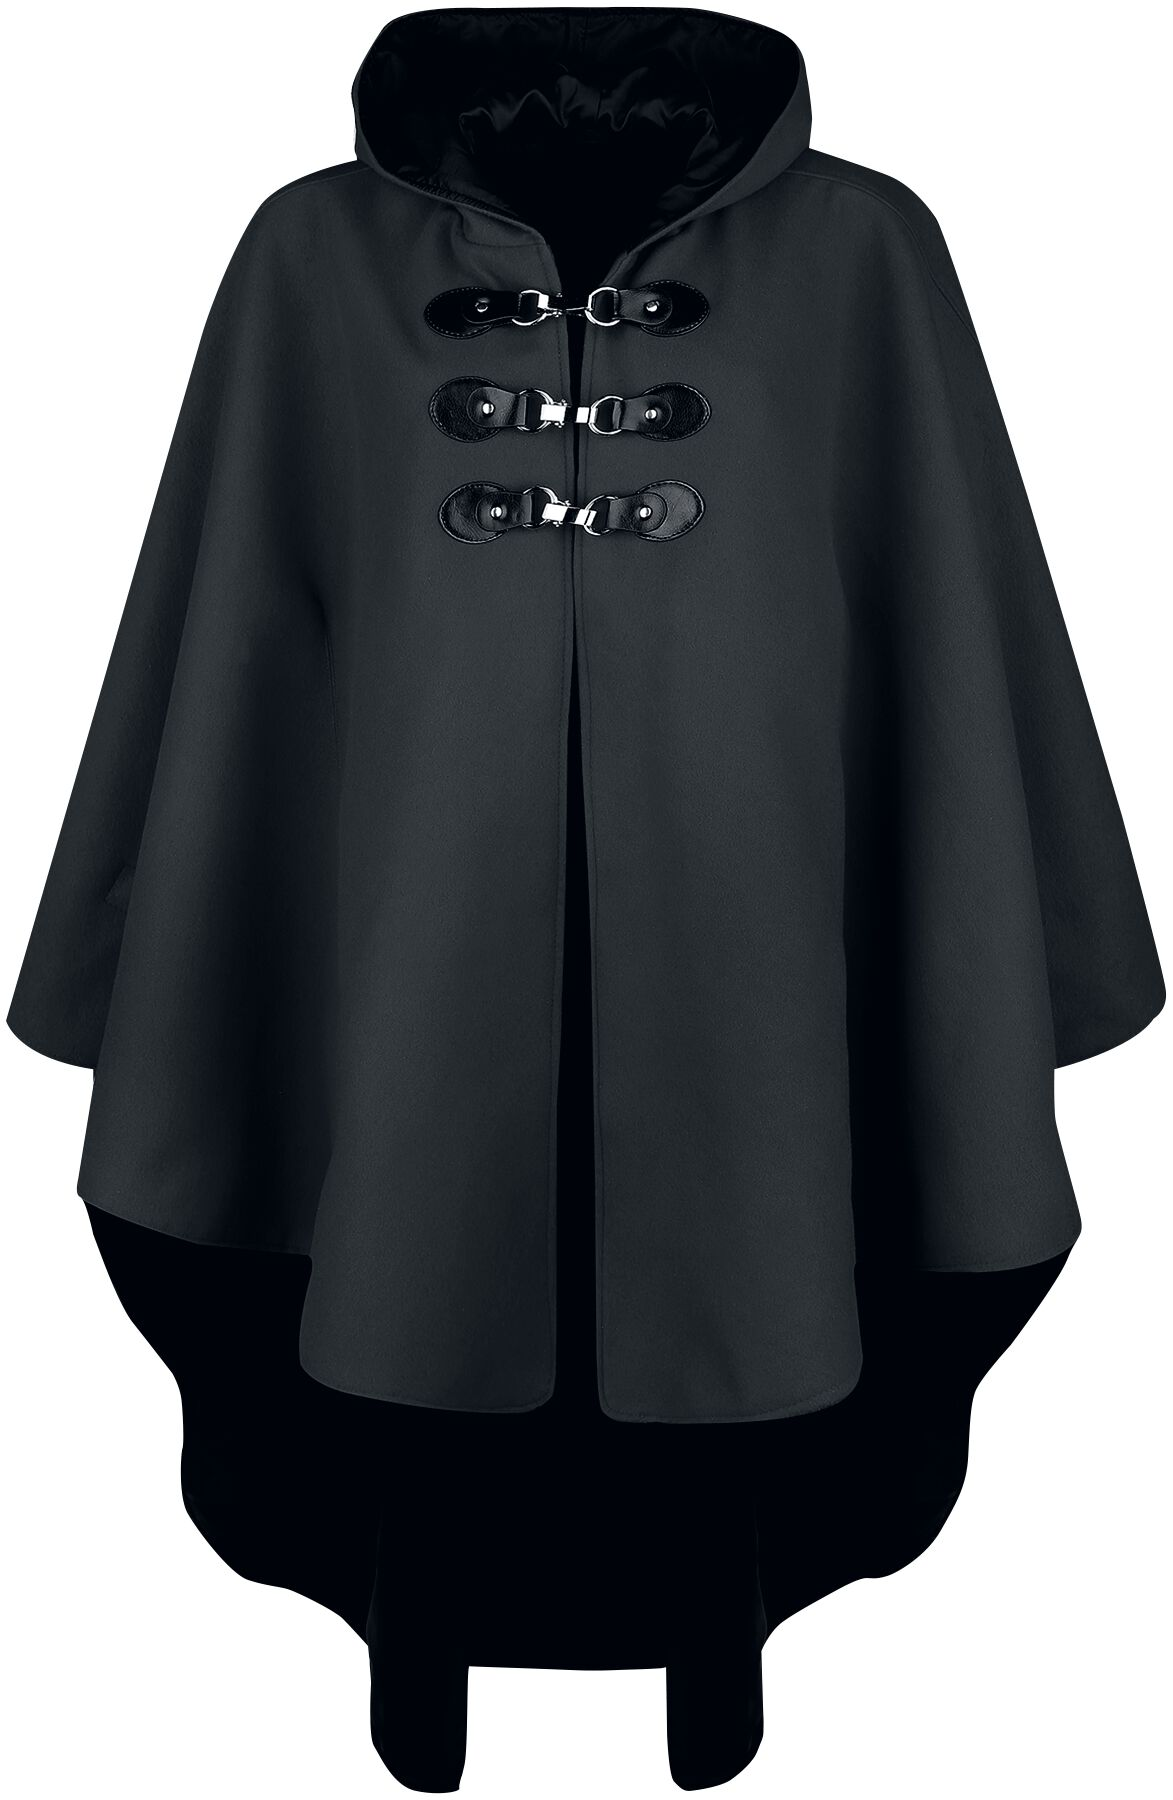 Image of Gothicana by EMP schwarzes Cape mit Kapuze Cape schwarz